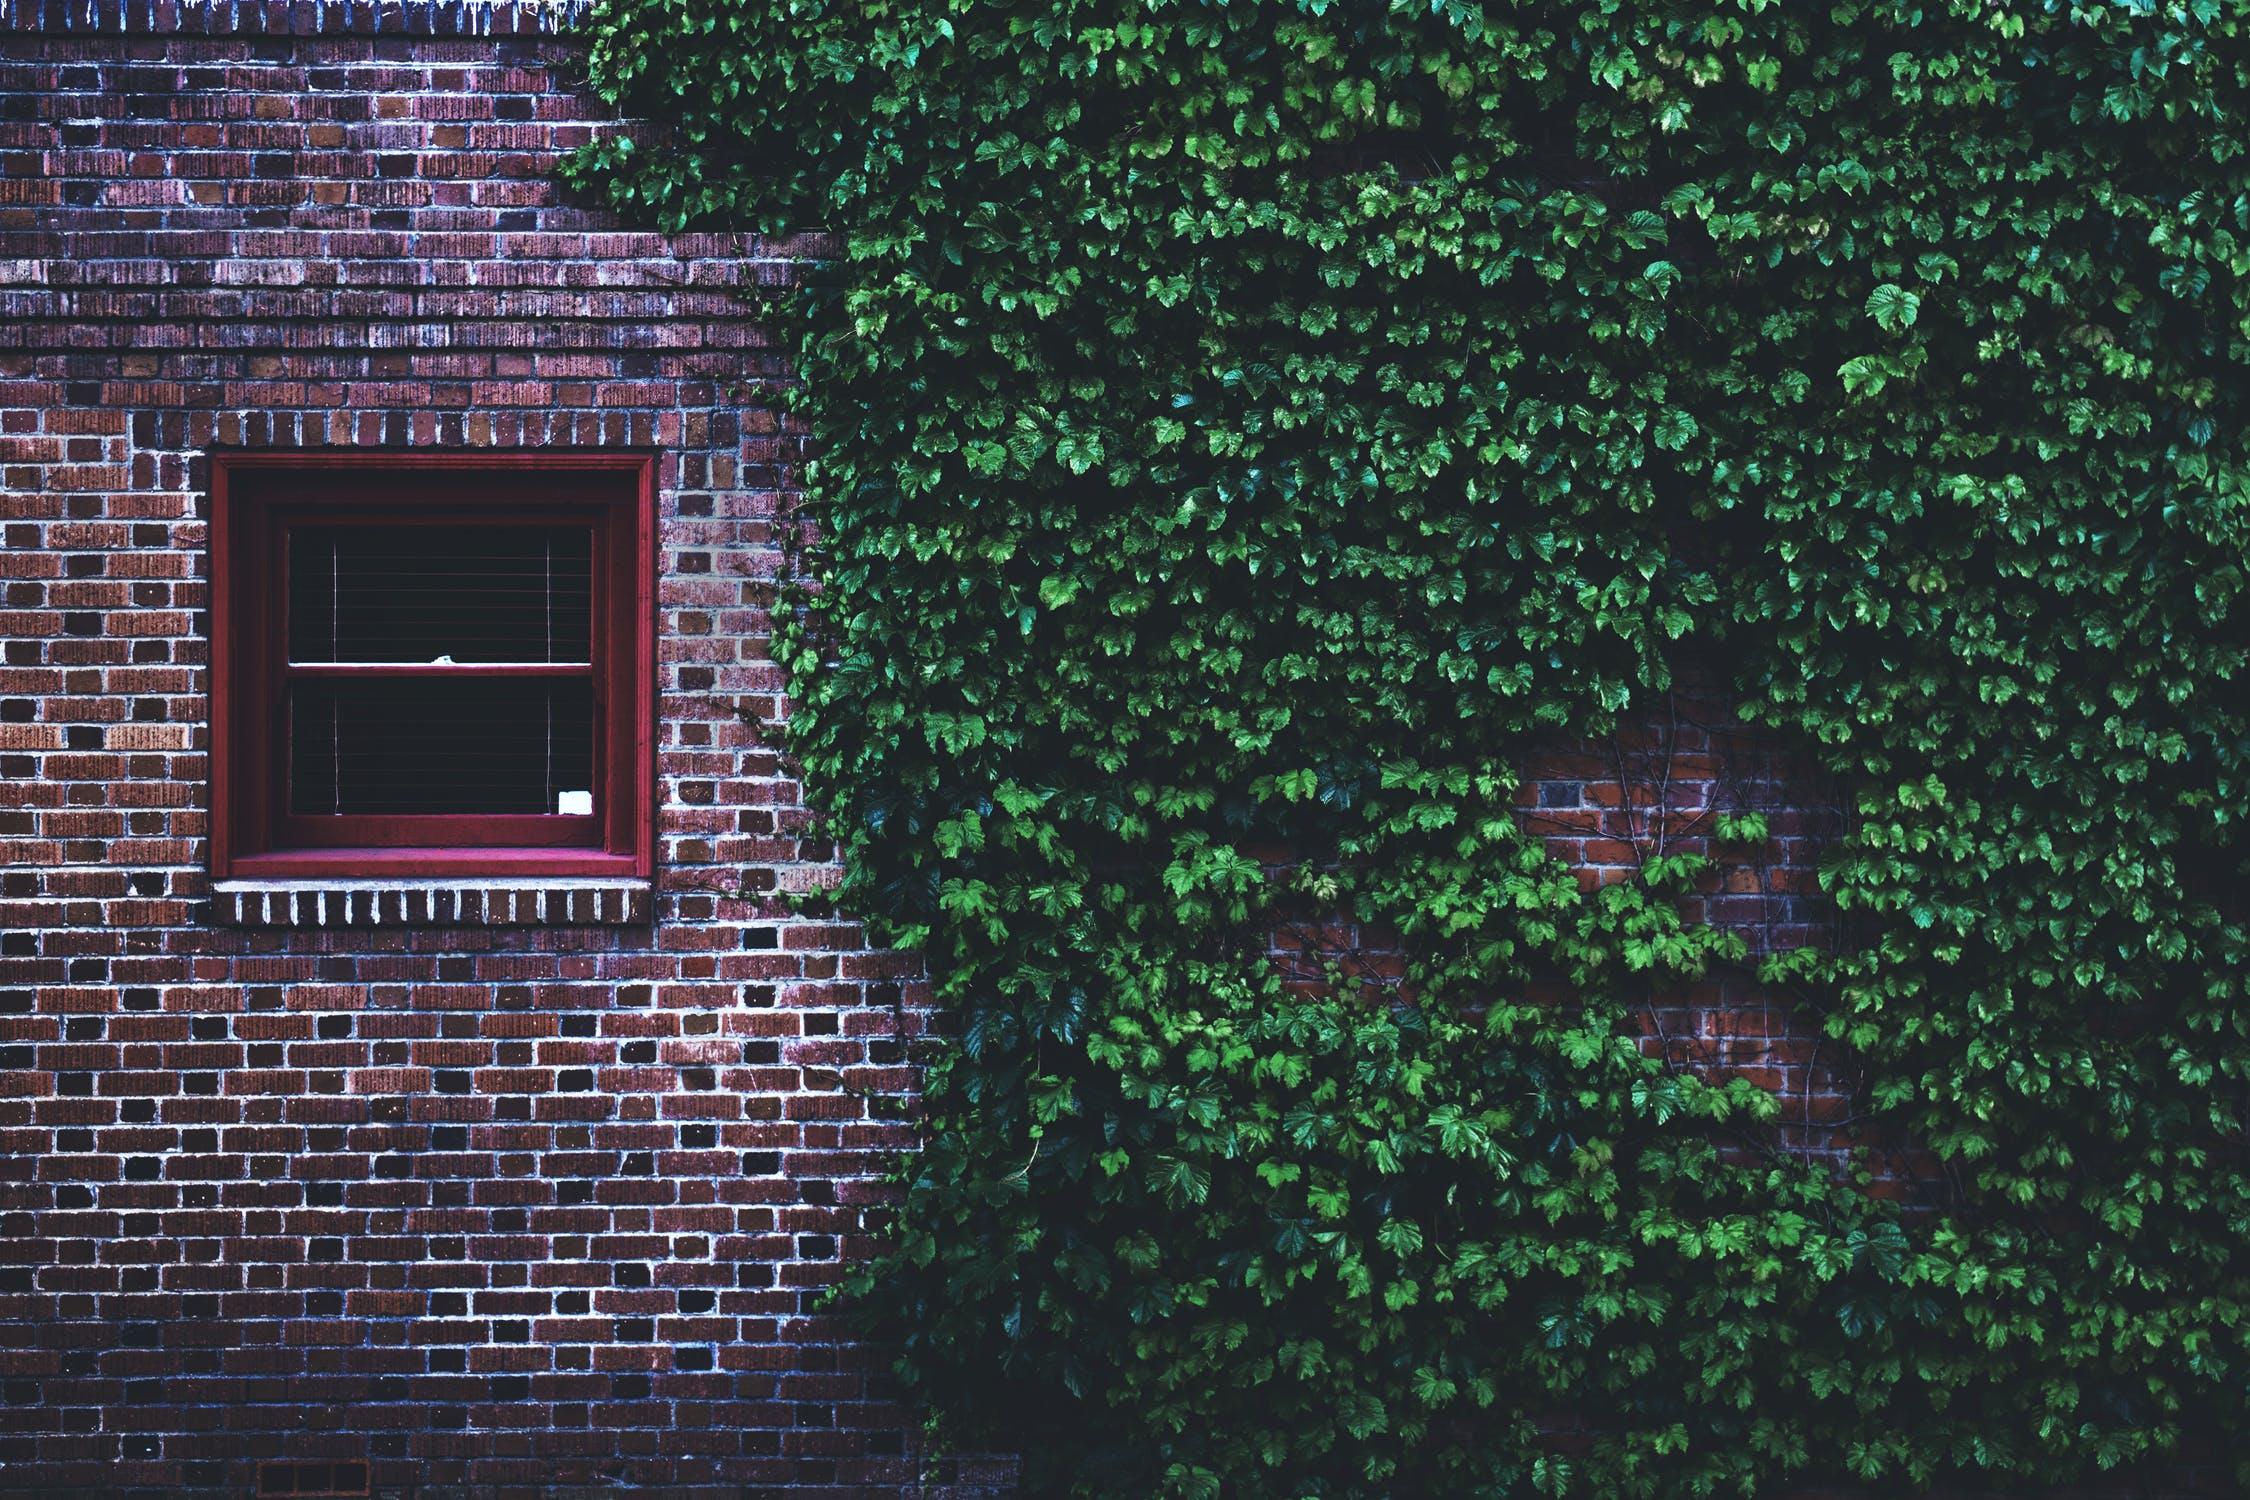 pexels-photo-1171384.jpeg